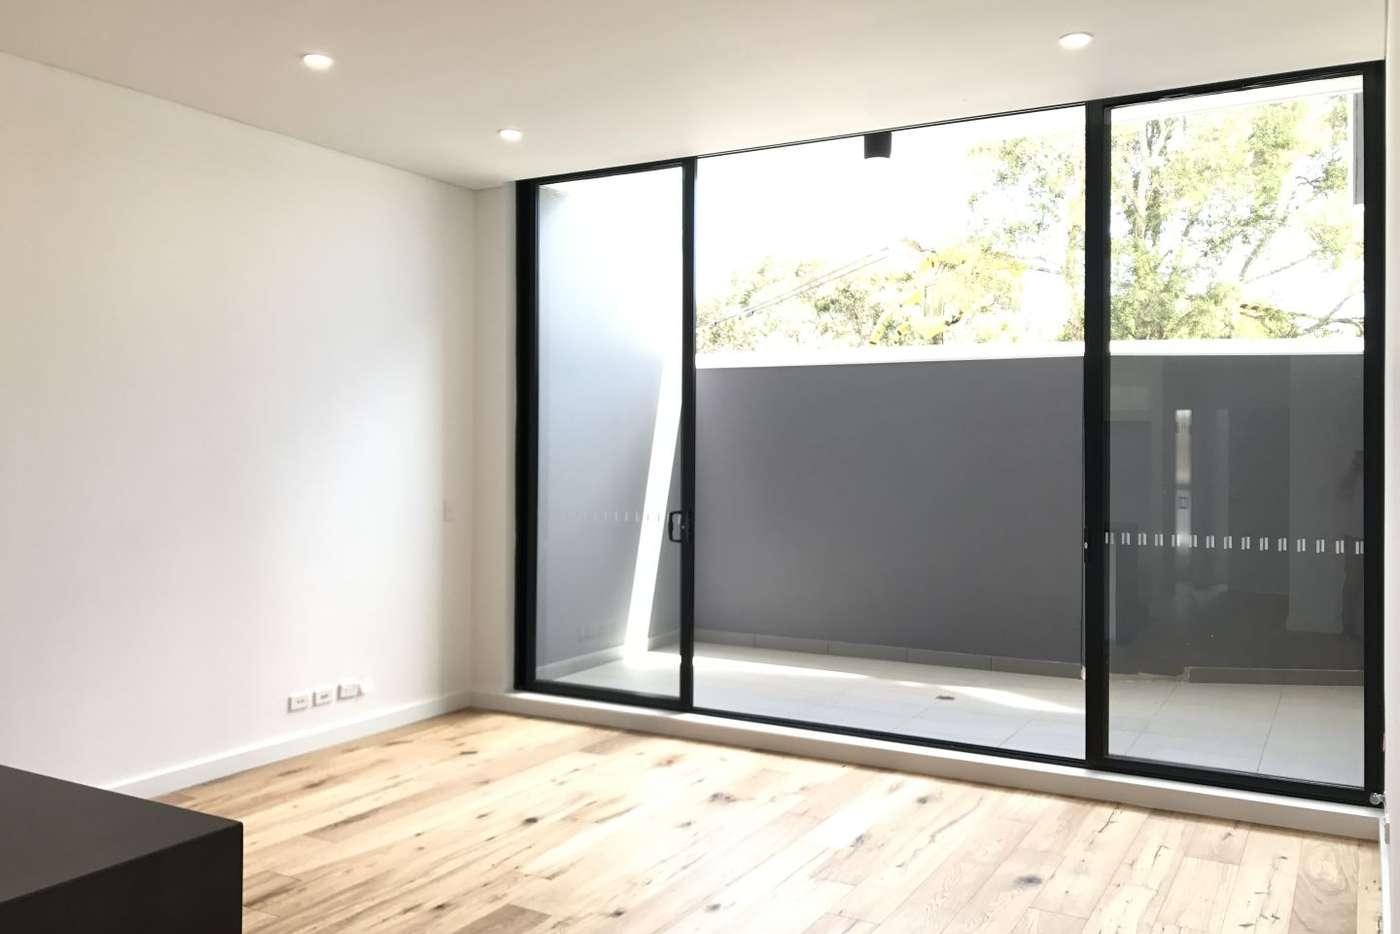 Sixth view of Homely apartment listing, 1.07/29-33 Birmingham Street, Alexandria NSW 2015